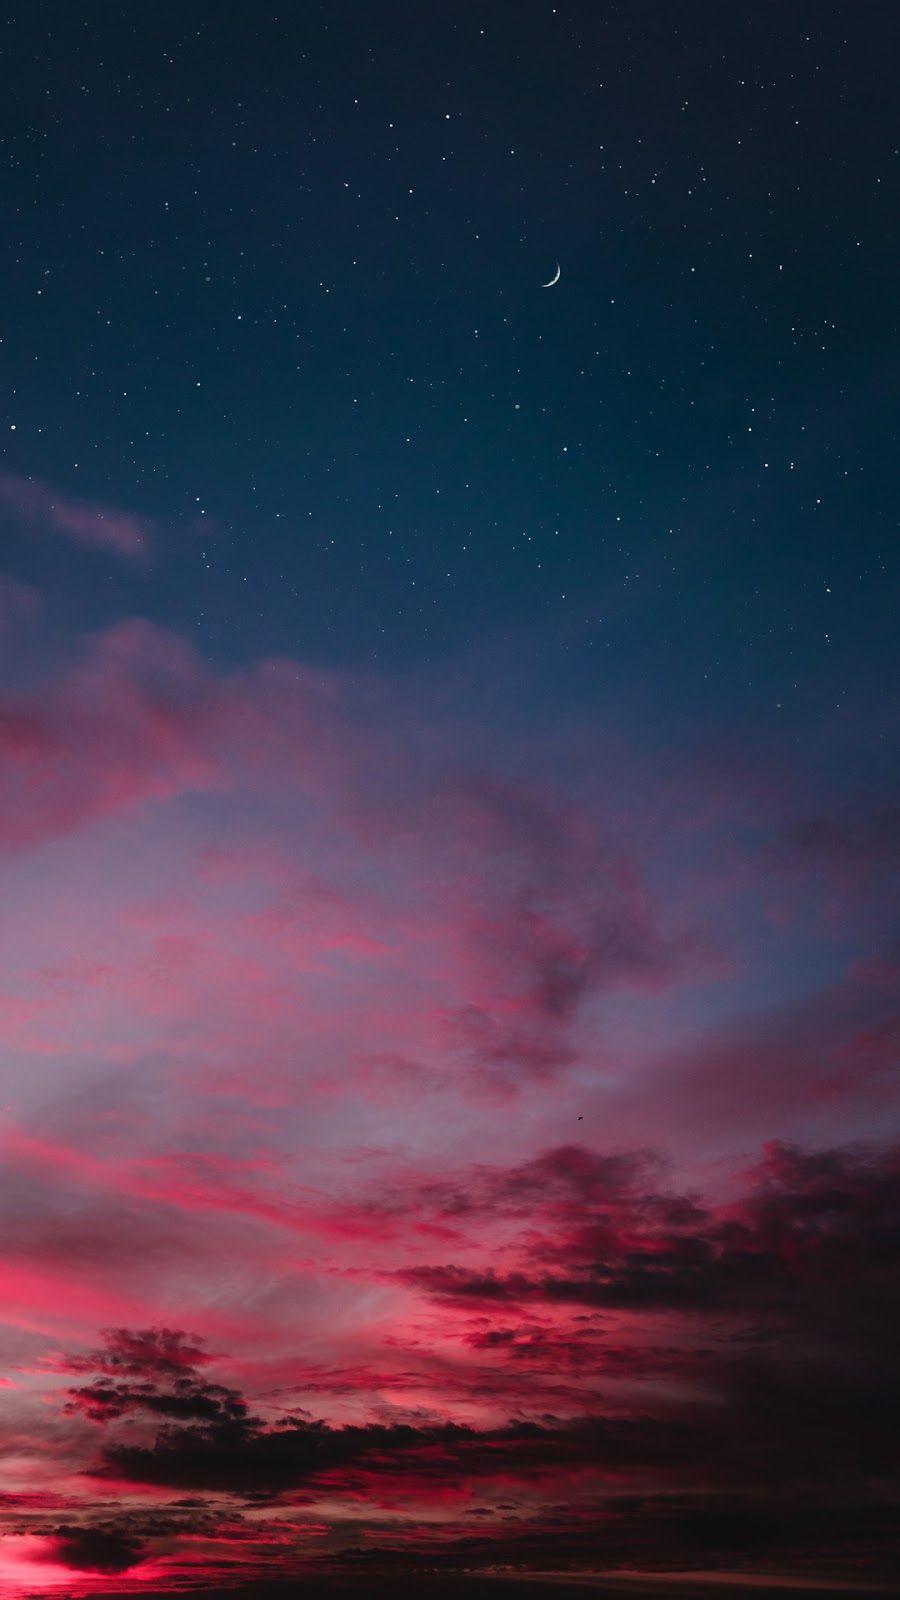 Red Cloud Wallpaper In 2020 Iphone Wallpaper Sky Cloud